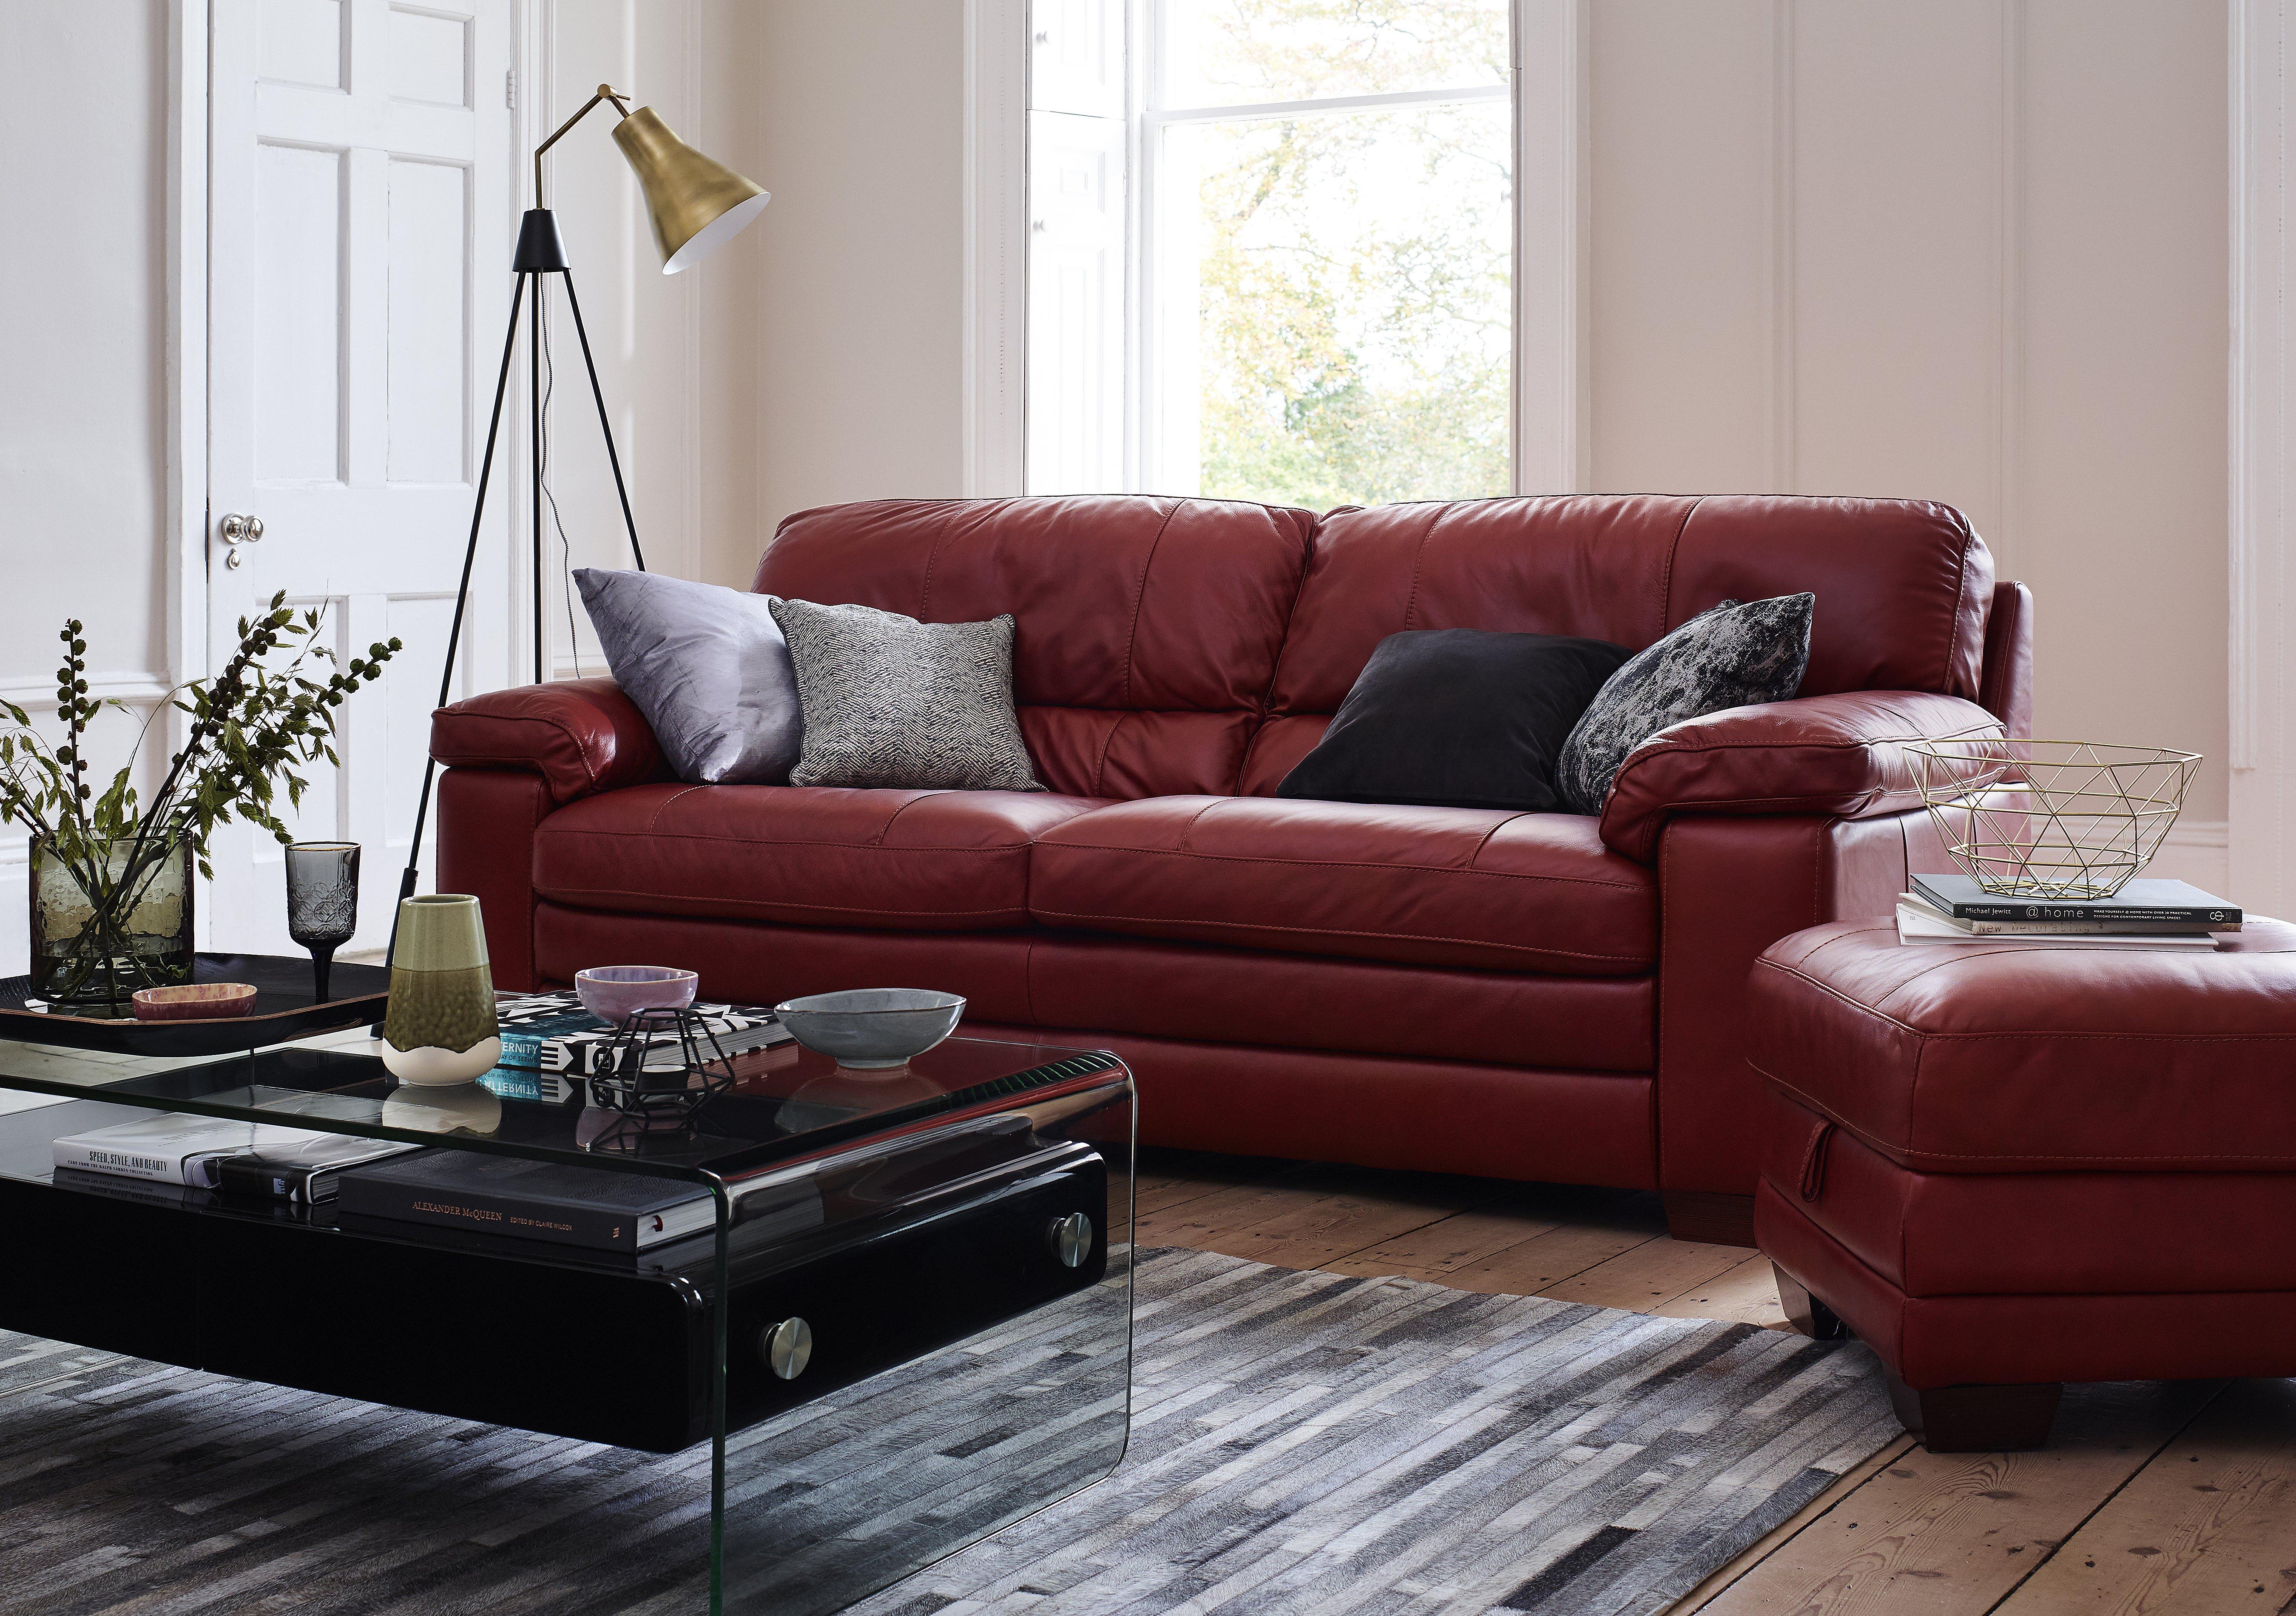 Carolina 2 Seater Leather Sofa World of Leather Furniture Village